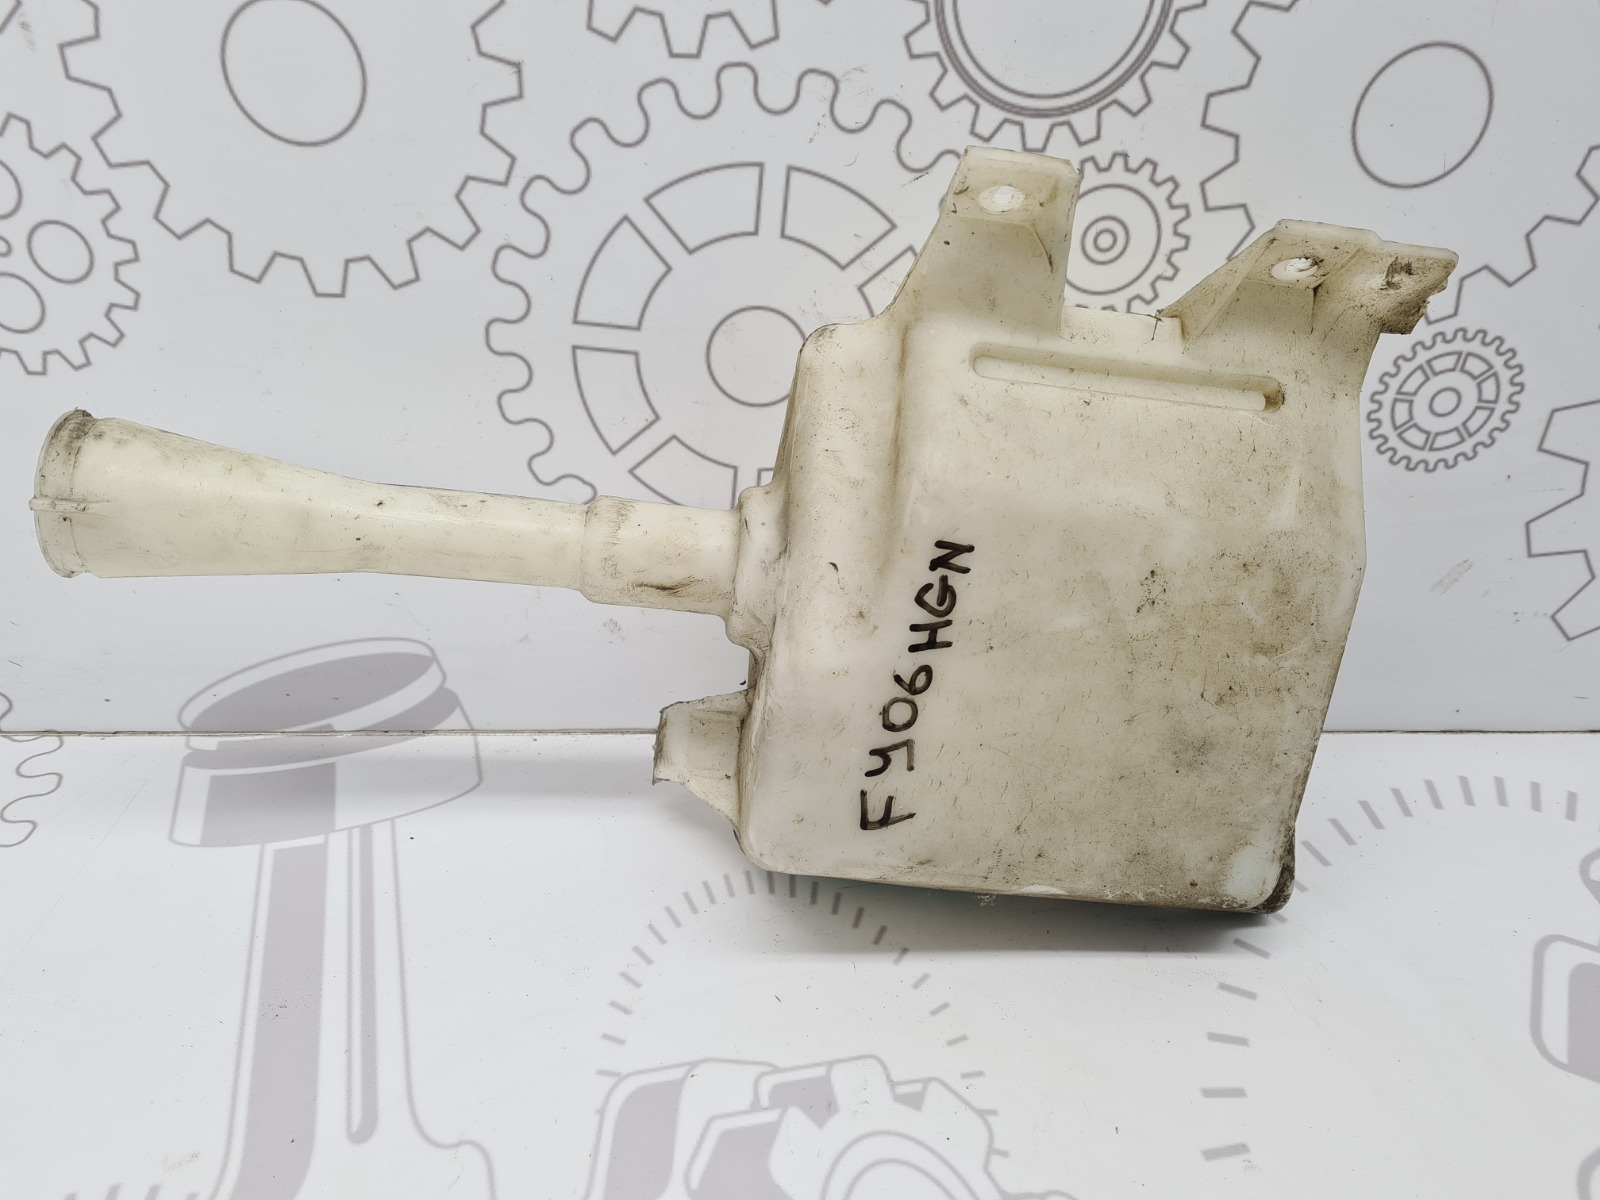 Бачок омывателя Nissan Almera N16 1.5 I 2006 (б/у)